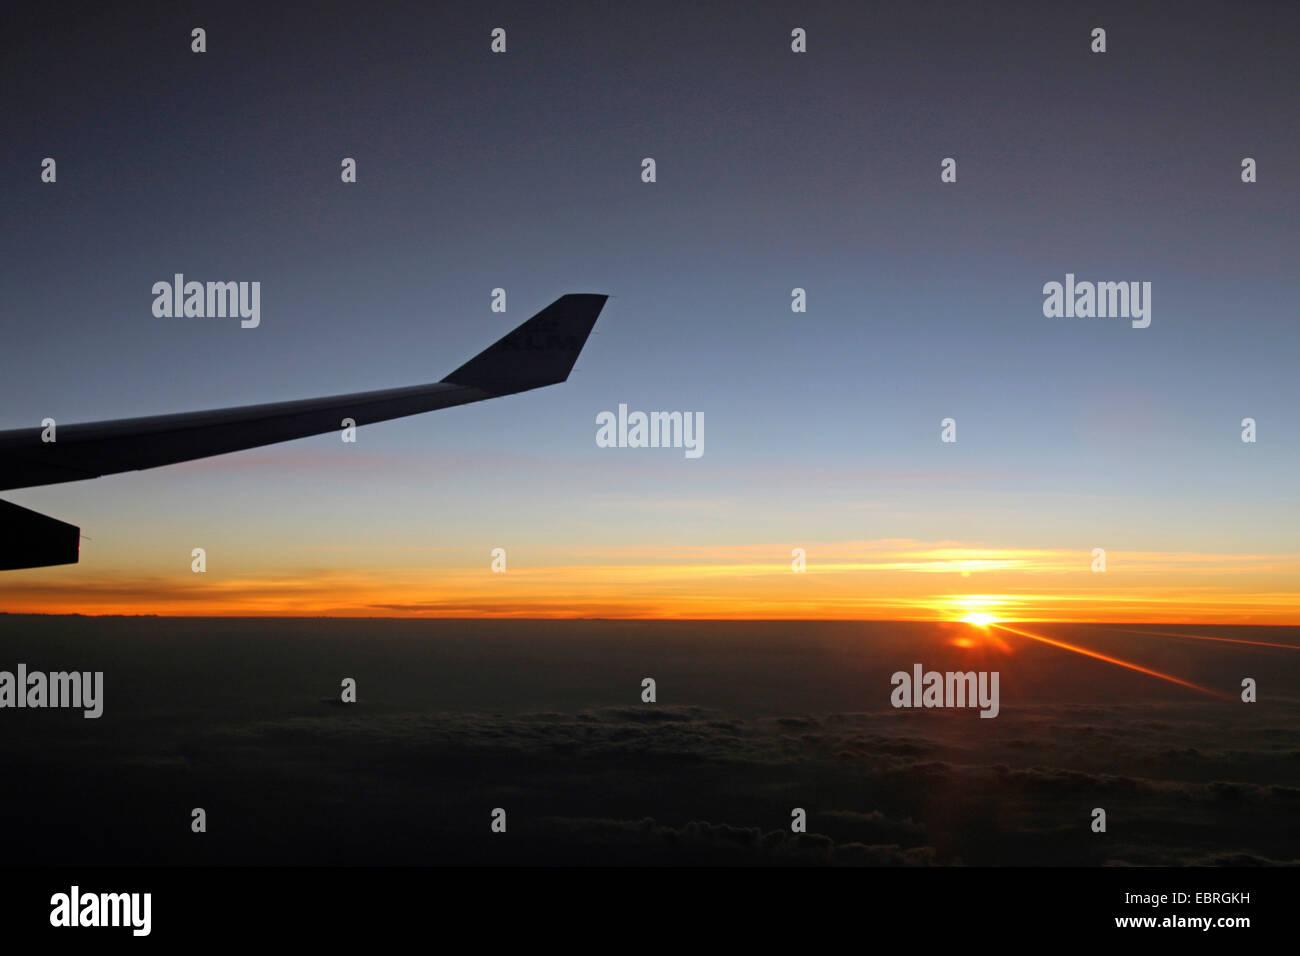 Lámina de aire en Sunset Imagen De Stock